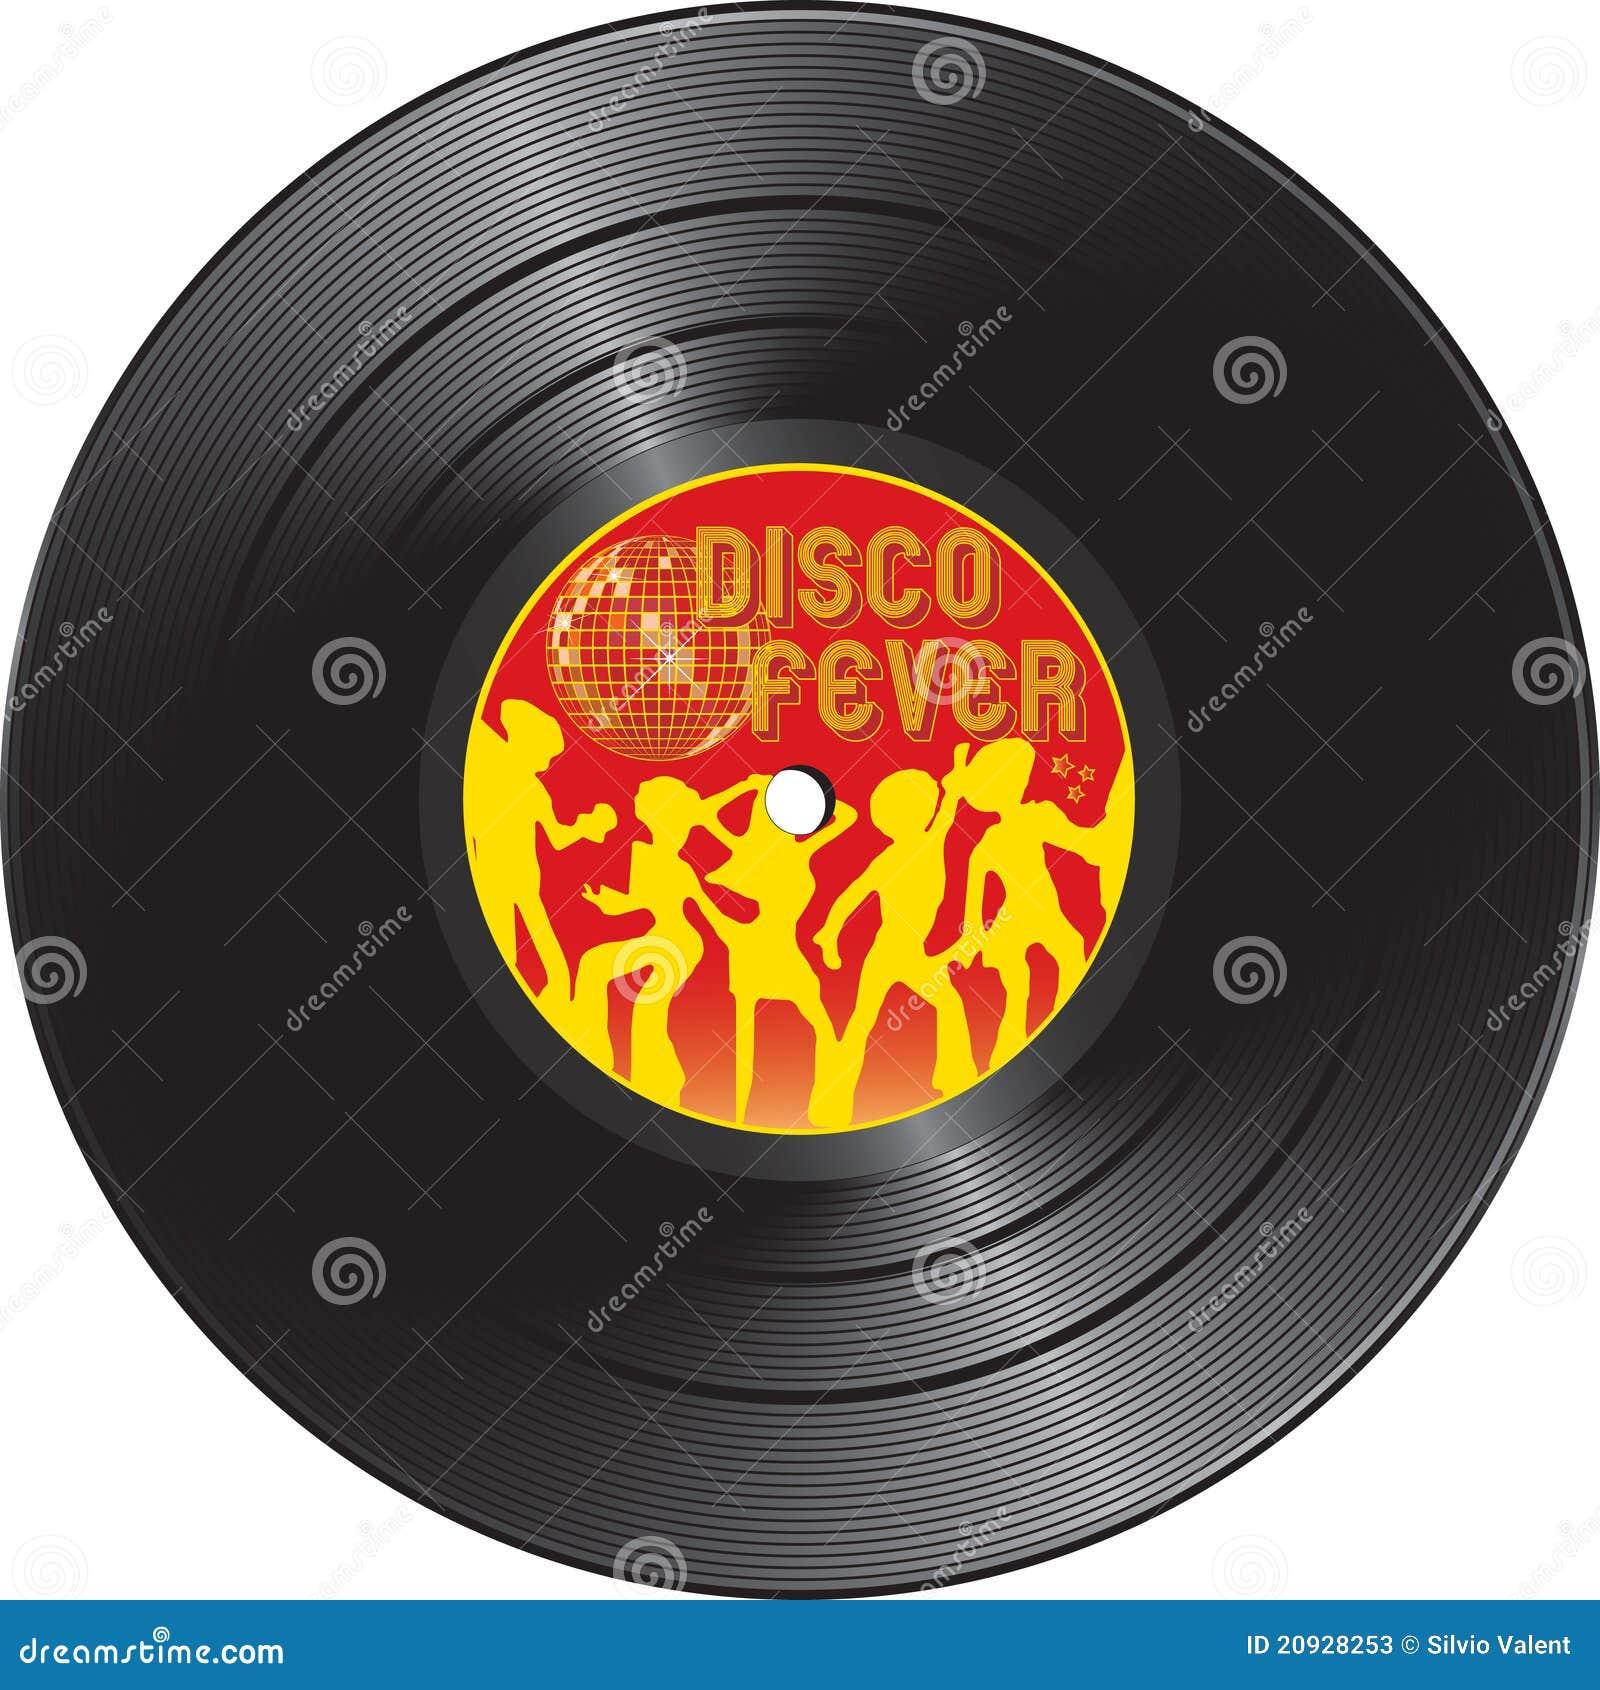 Vinyl Record With Disco Fever Stock Photos Image 20928253